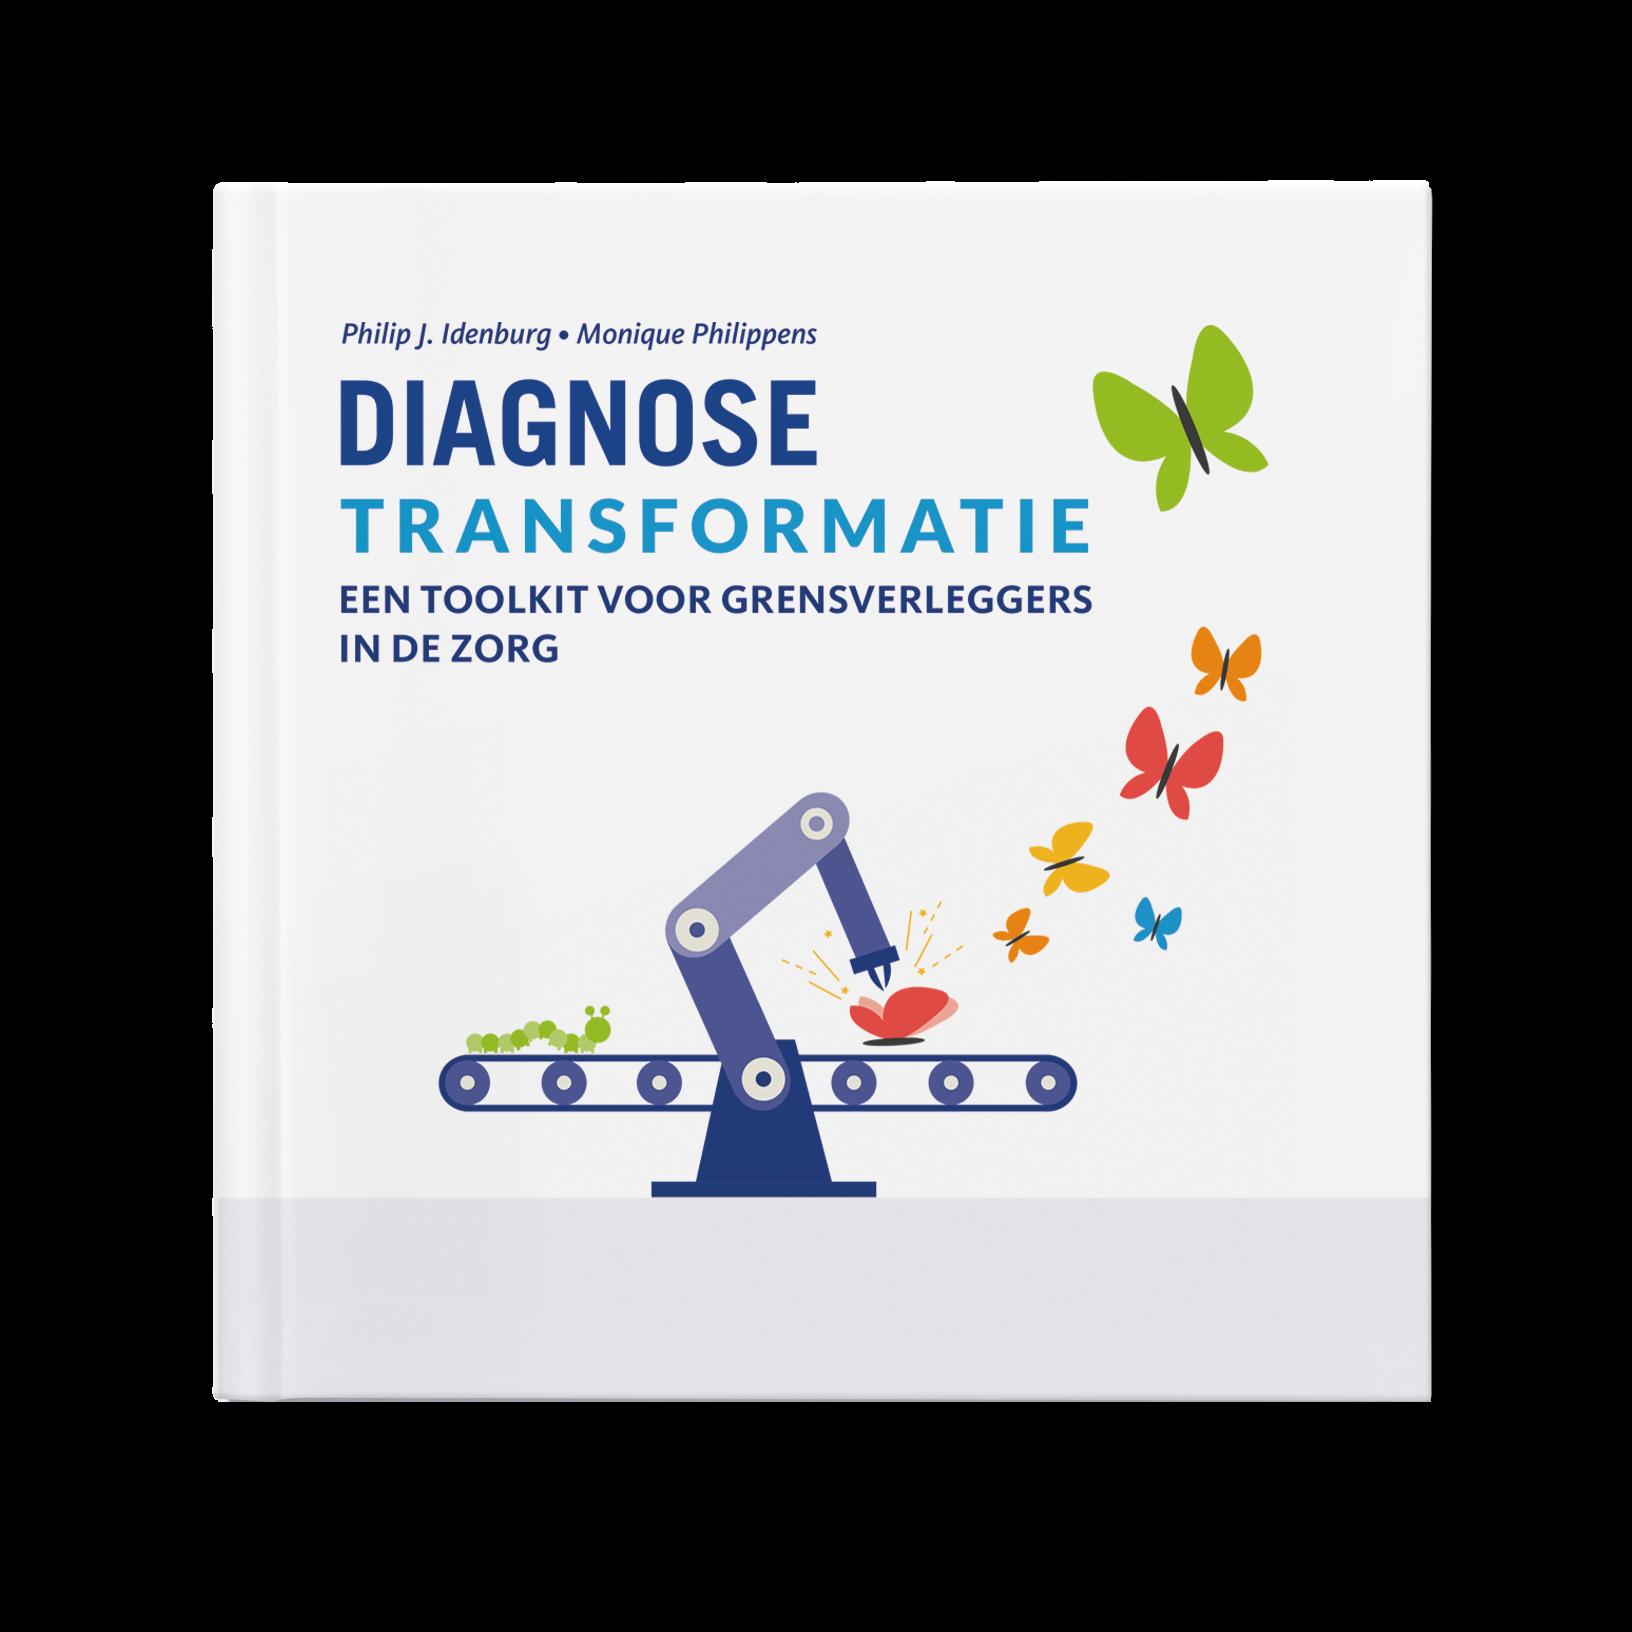 Mockup_boek_diagnose